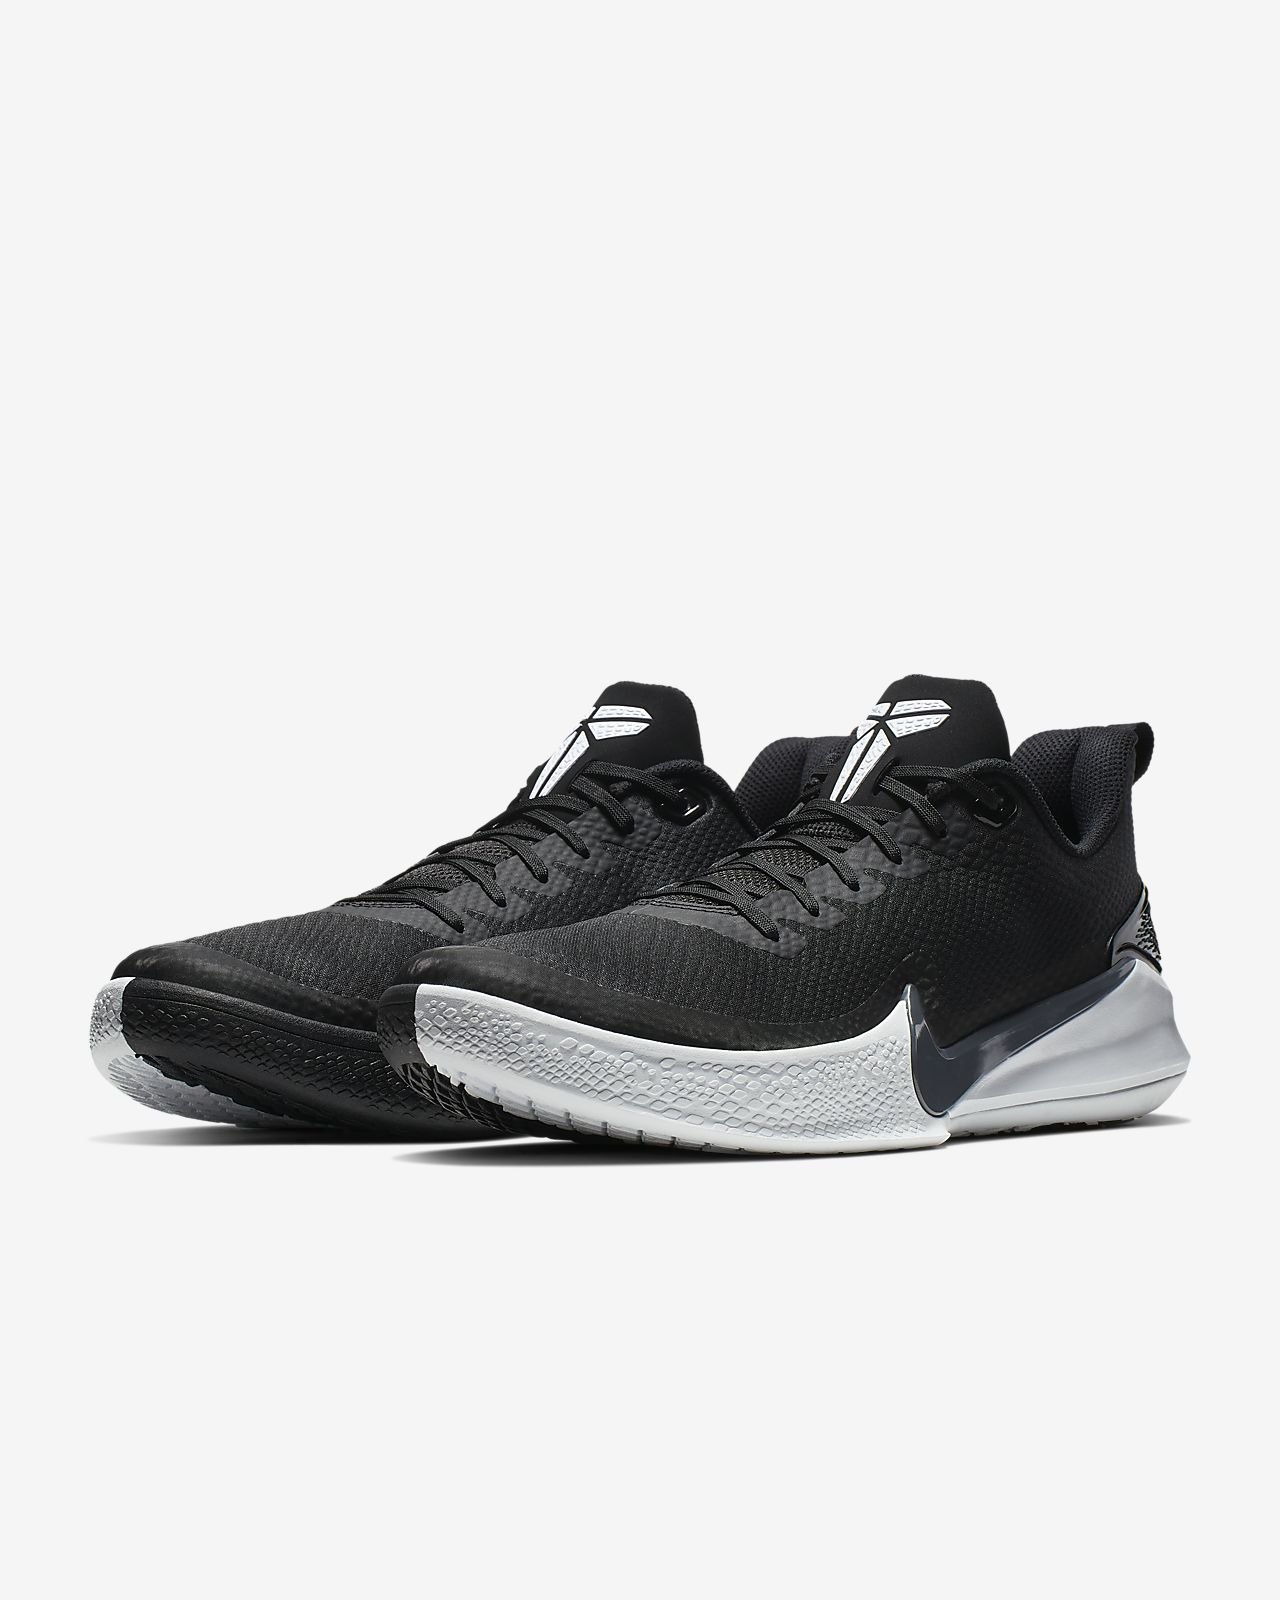 0869ca8fe5aa Low Resolution Mamba Focus Basketball Shoe Mamba Focus Basketball Shoe